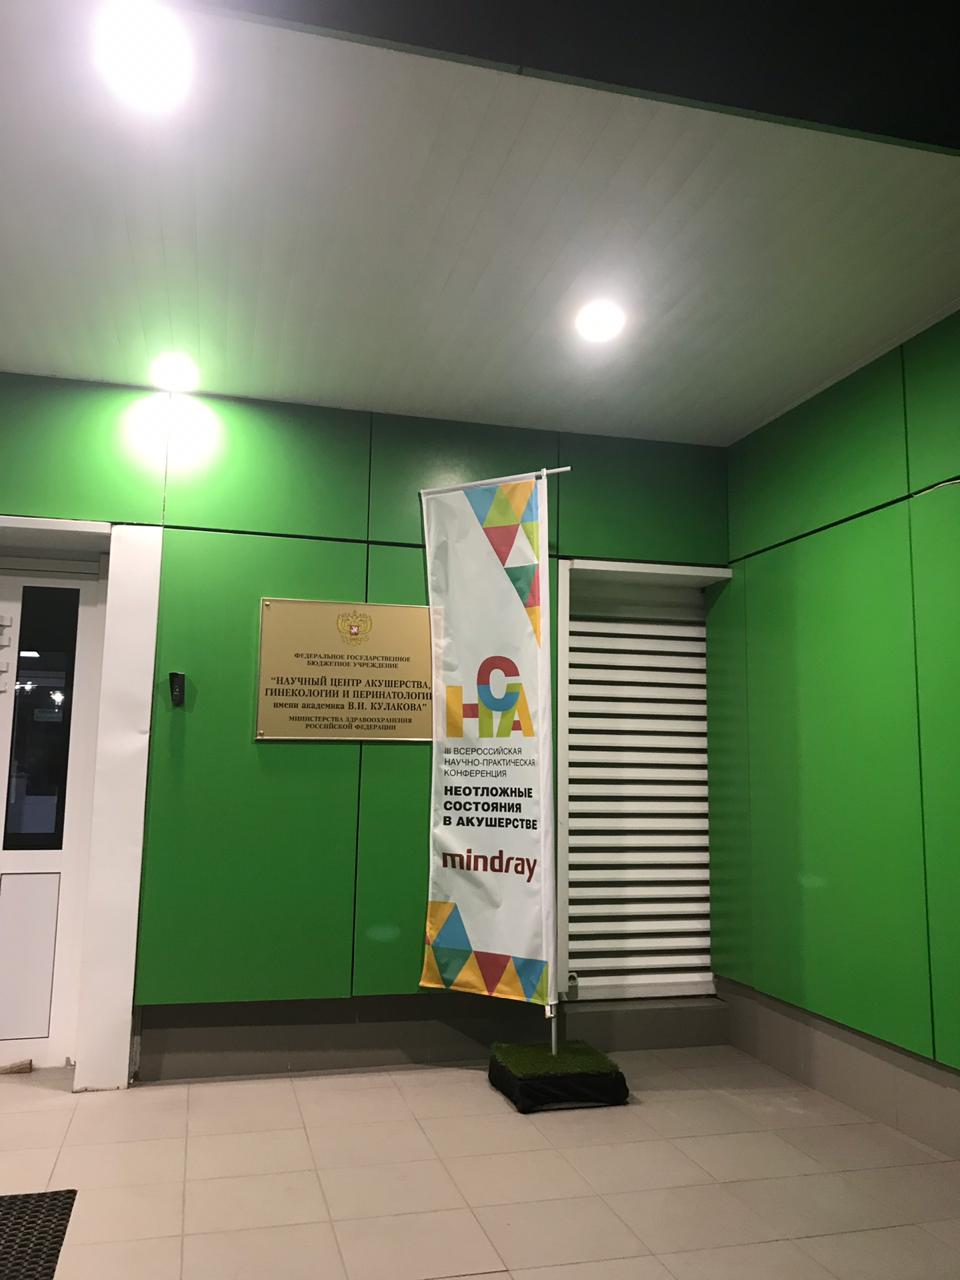 рекламный флаг виндер парус бриз